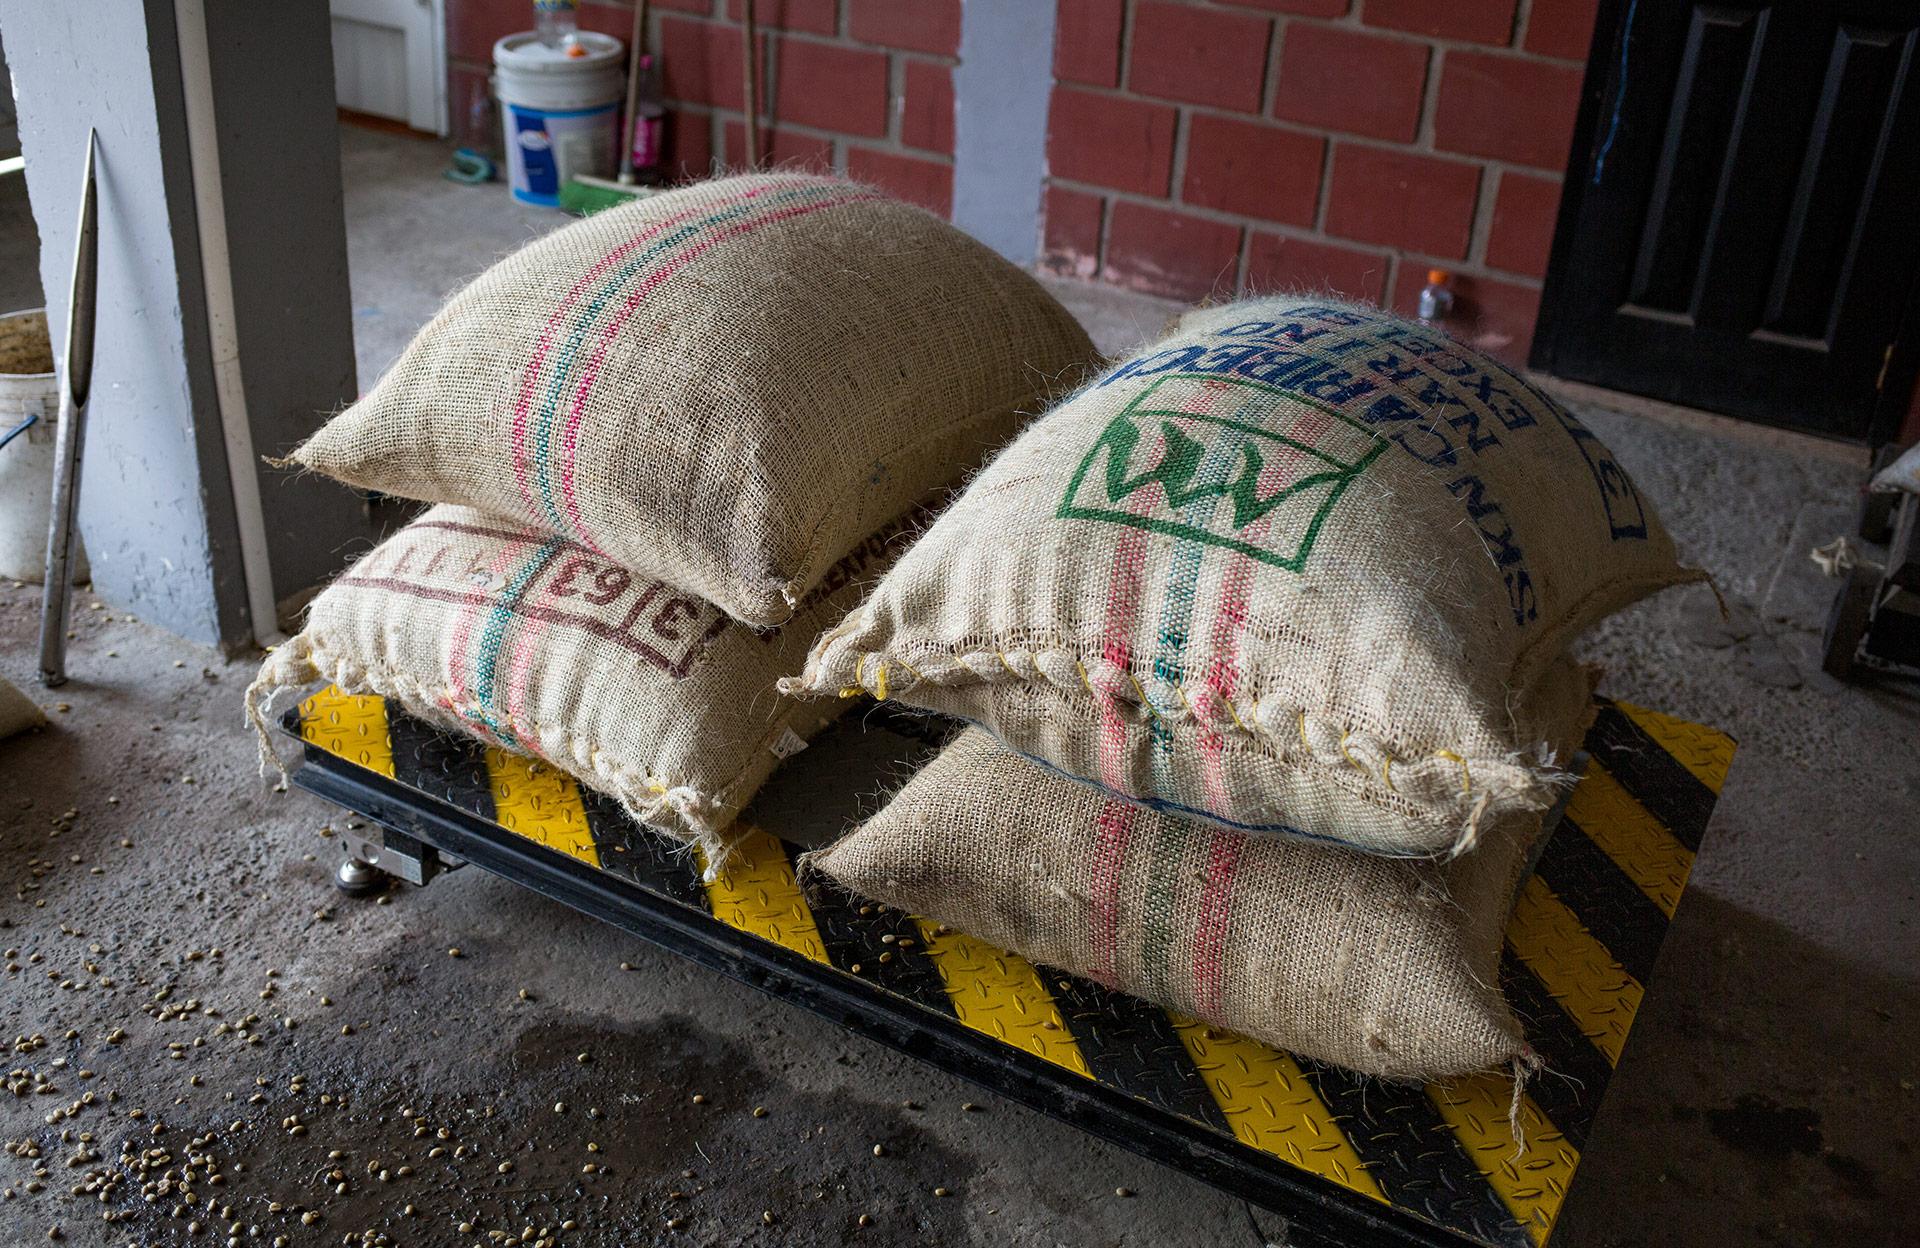 C Coffee: Kaffee als börsengehandelte Ware. CafCaf.de – Kaffee & Blog, Kaffeeblog